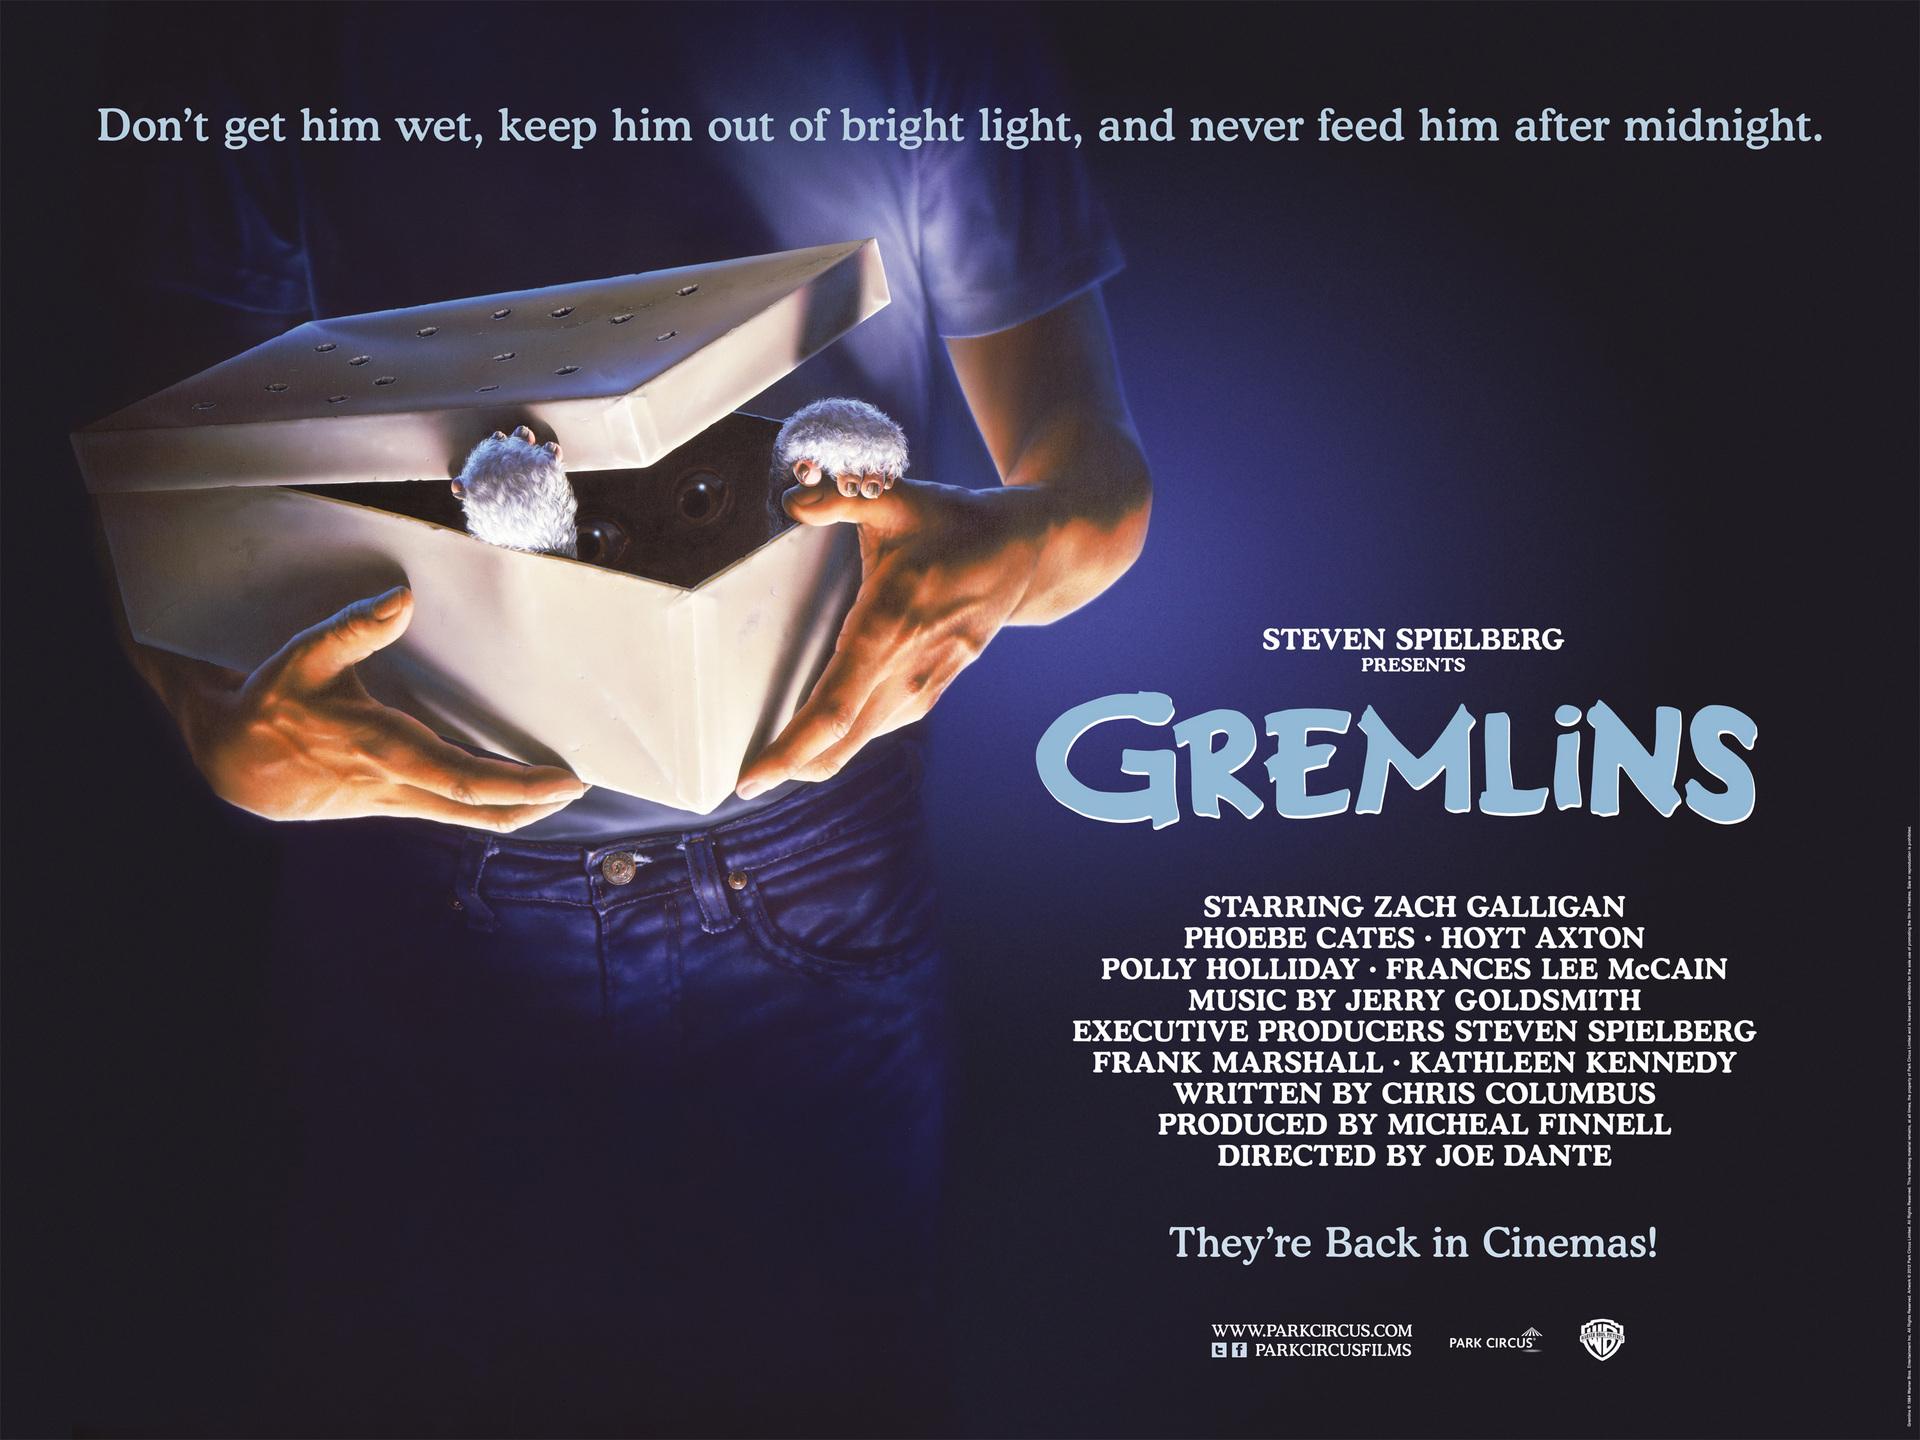 Gremlins - Trailer And Cinema Quad Reissued | Park Circus